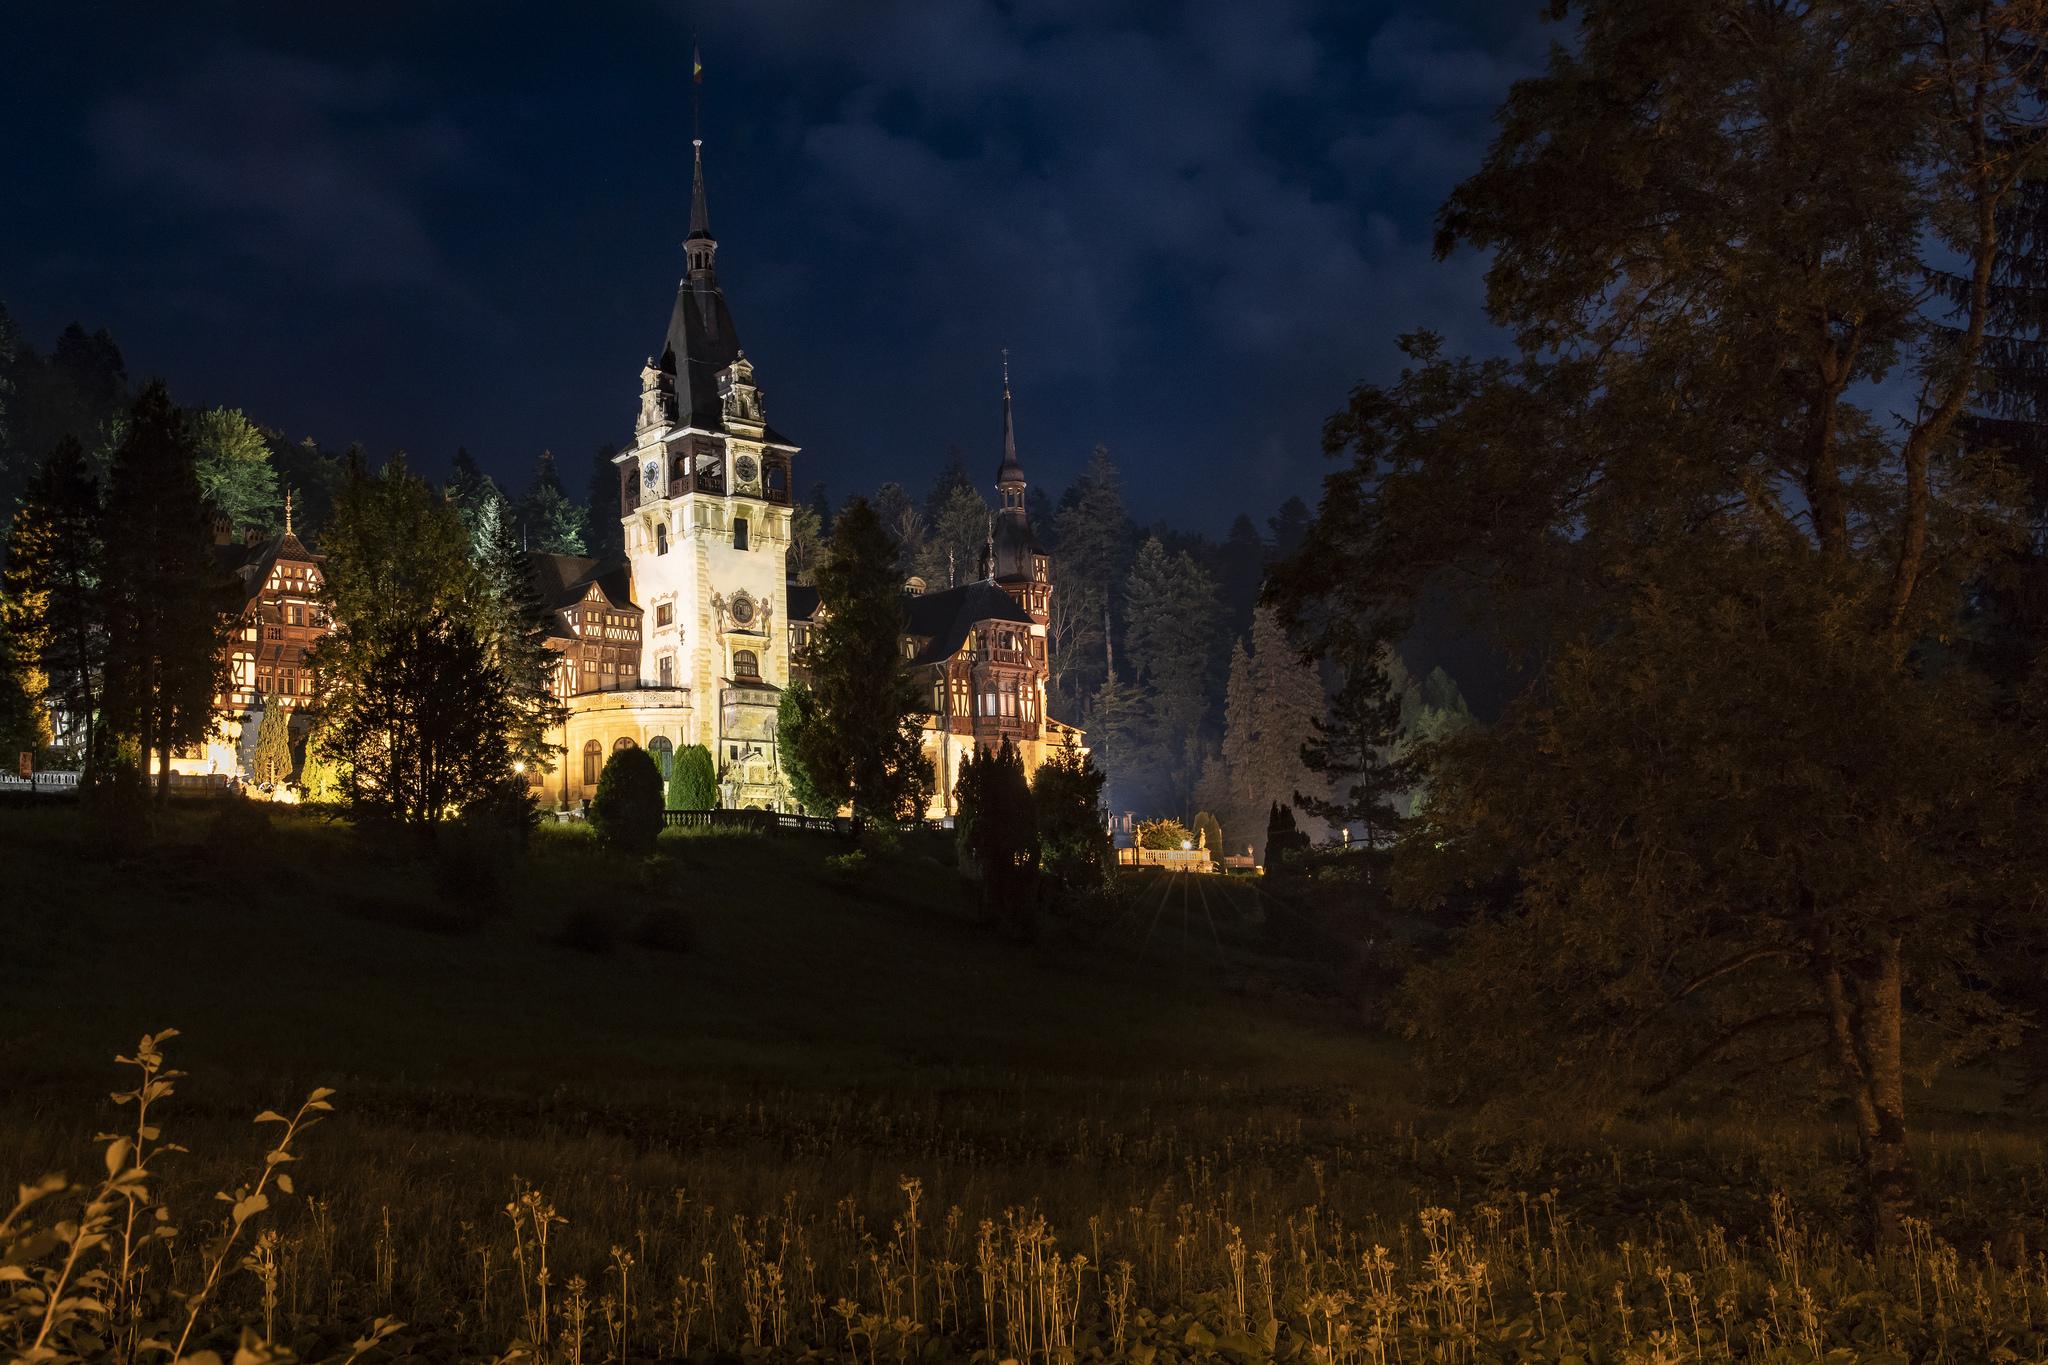 Romanian Renaissance - Peles Castle (Sinaia, Romania)